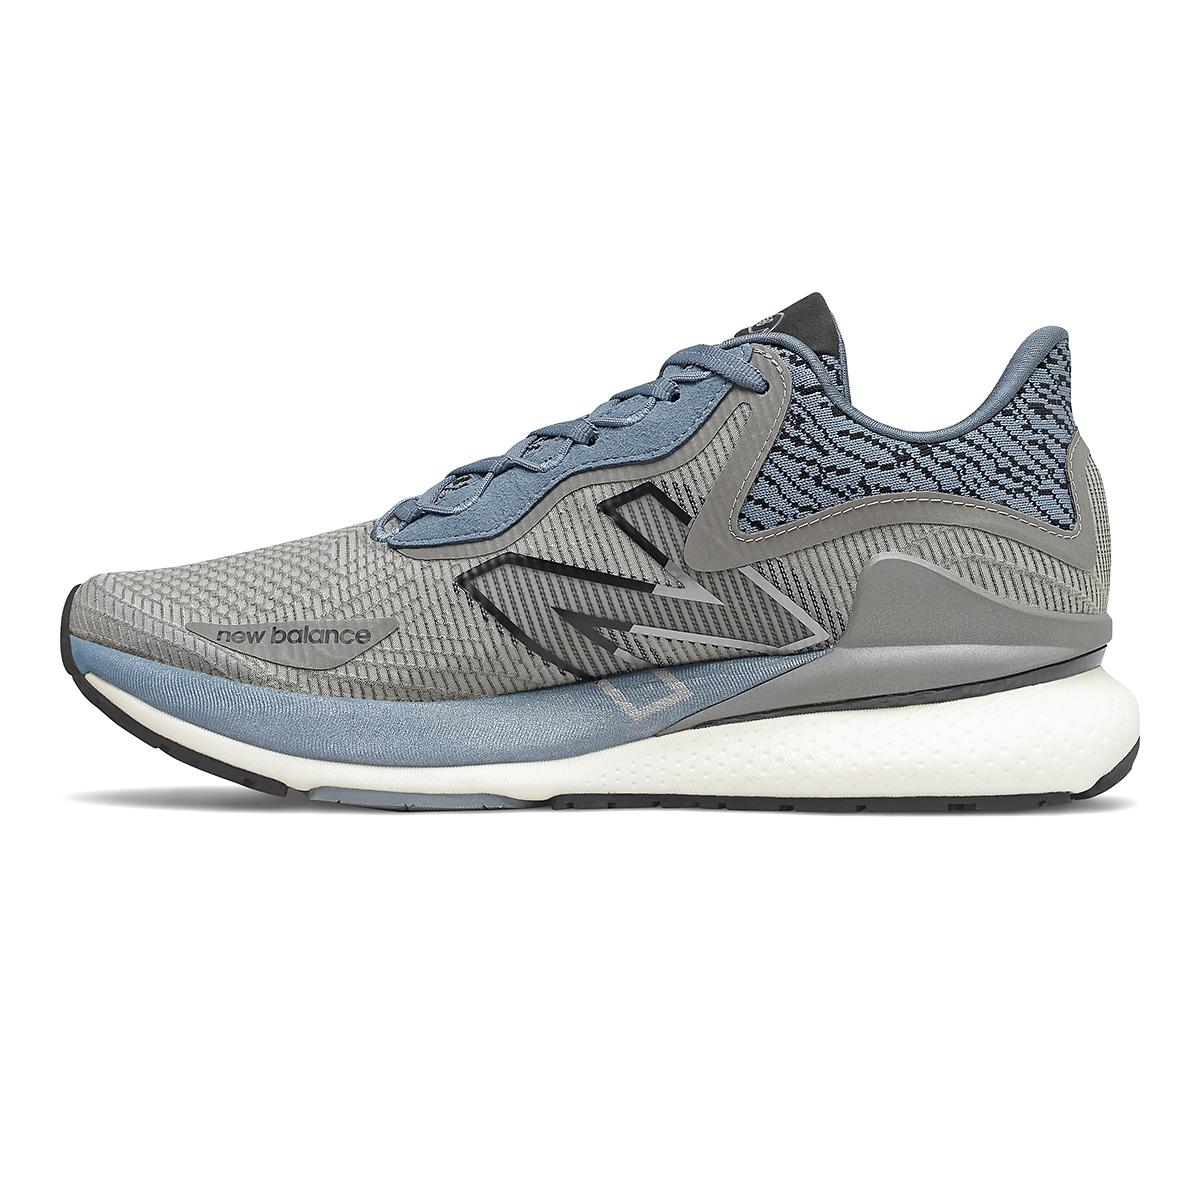 Men's New Balance Lerato Running Shoe, , large, image 2